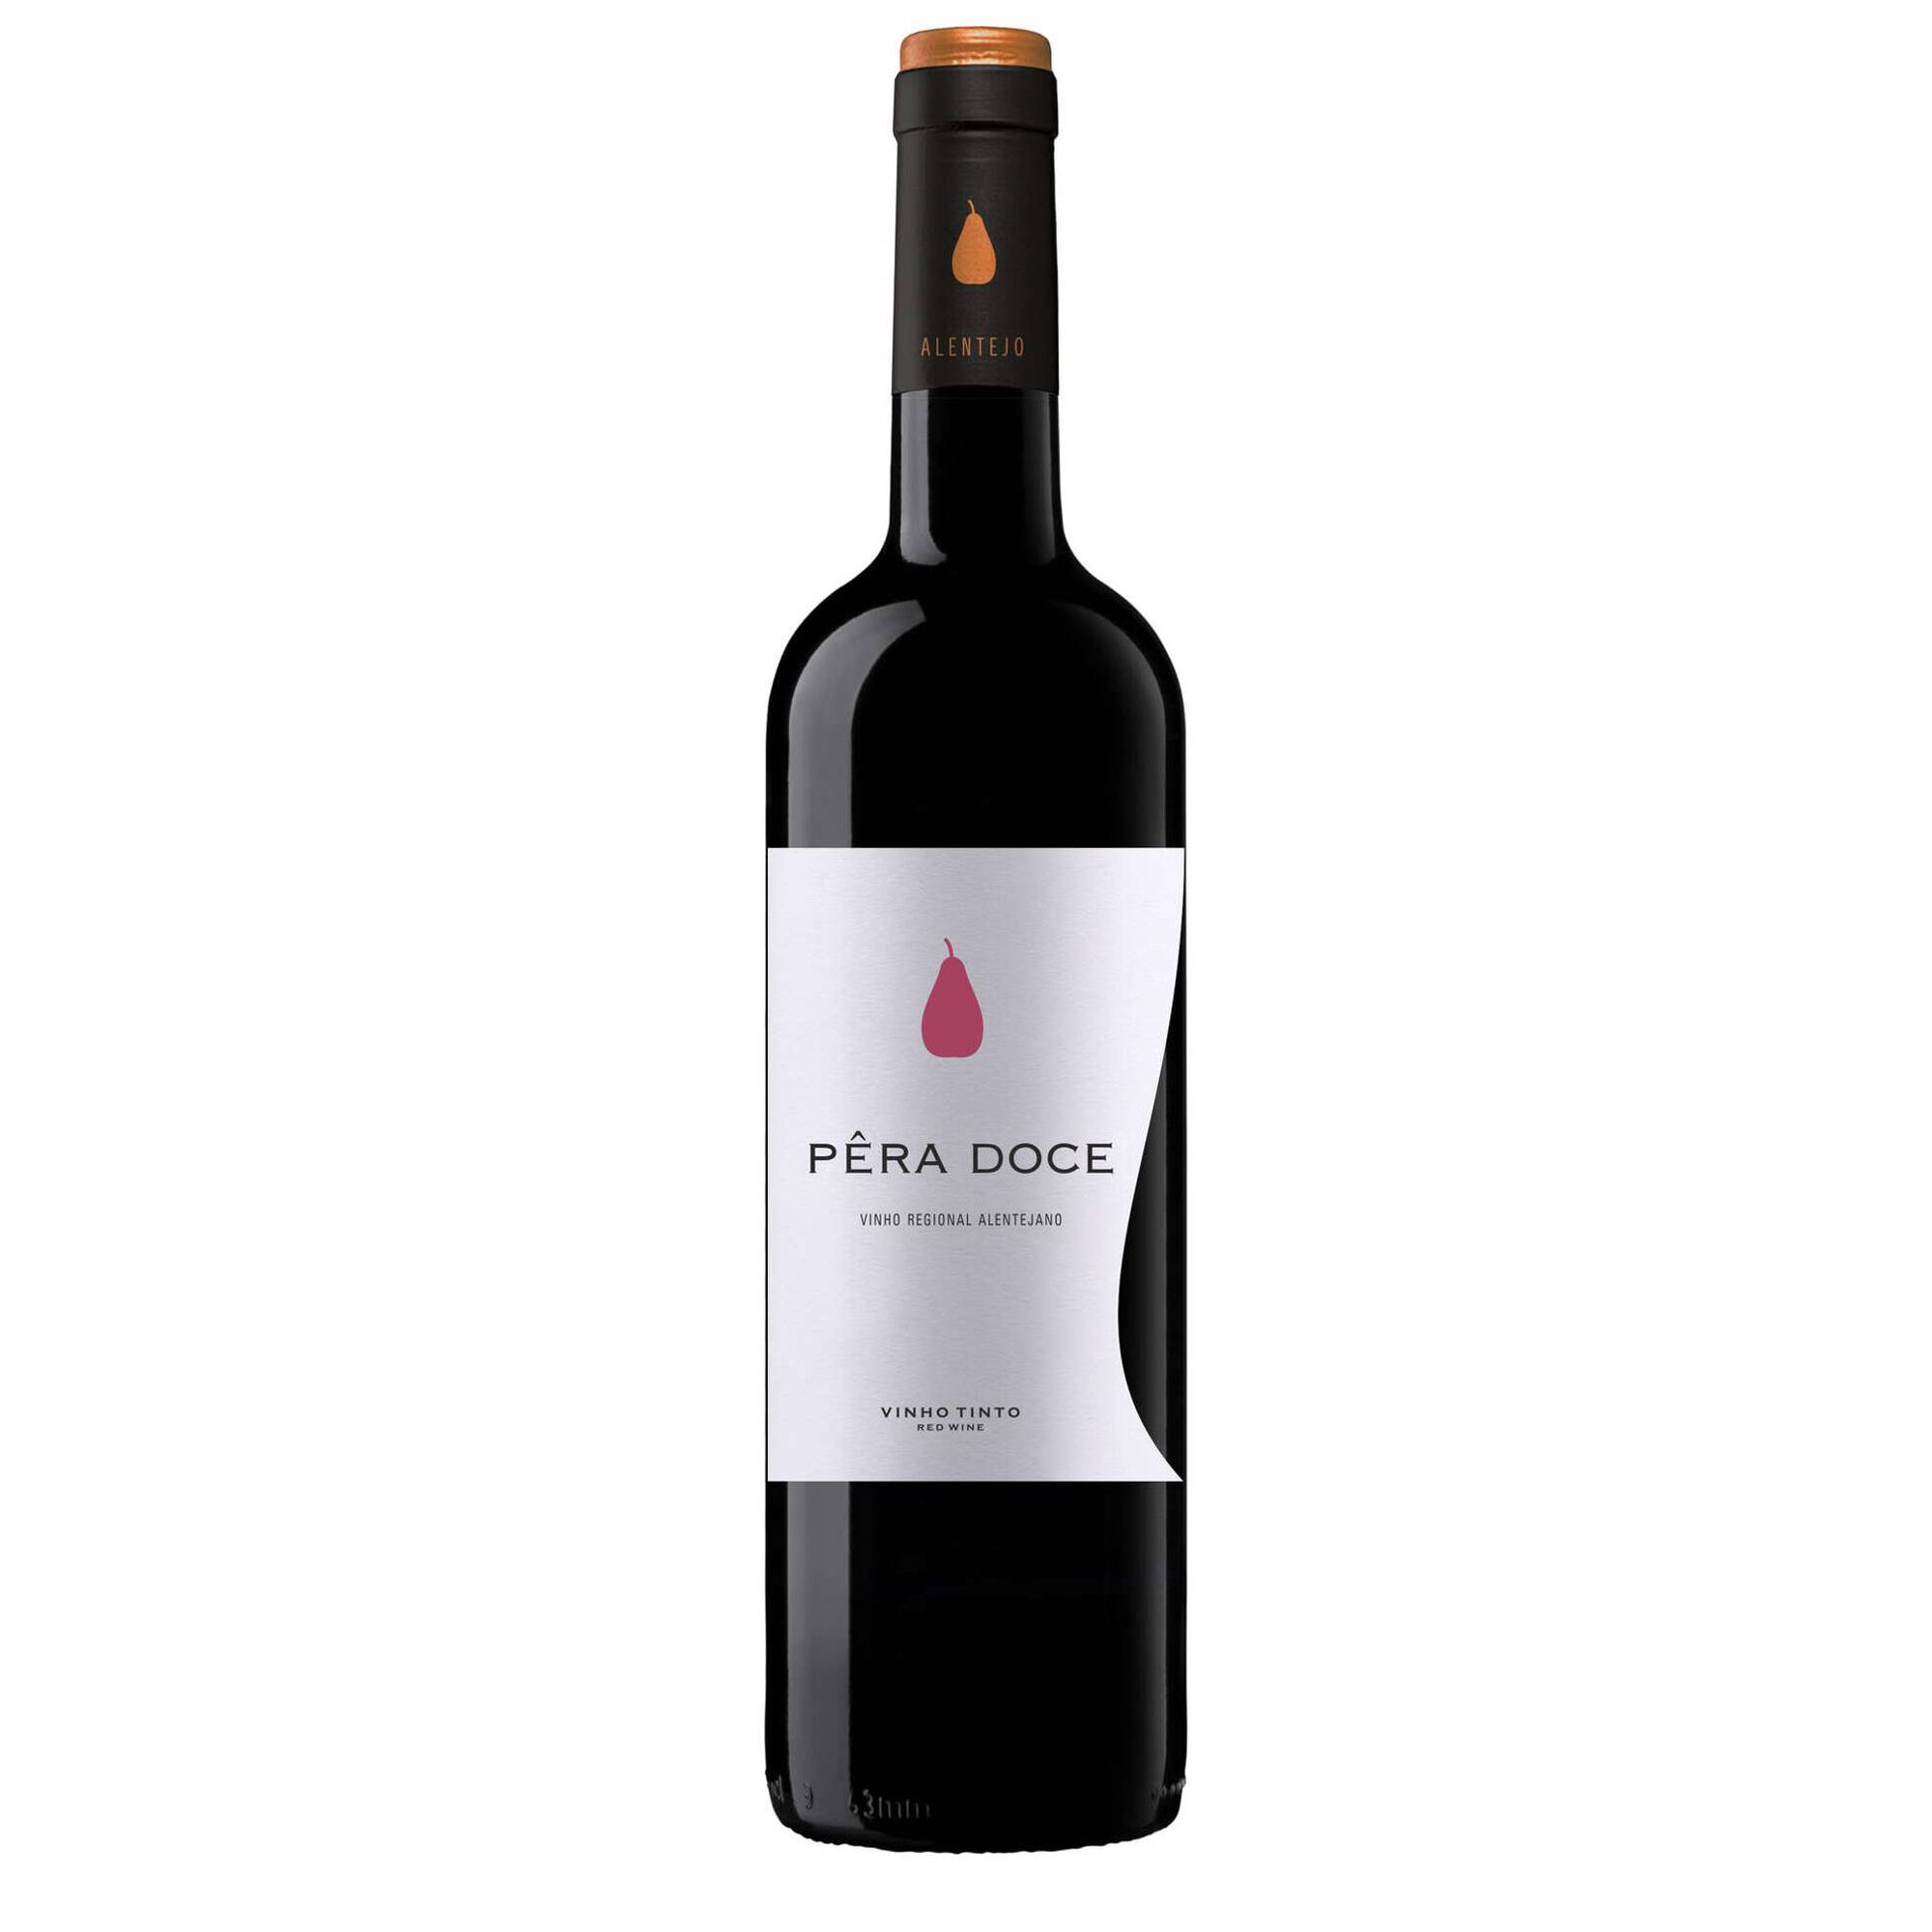 Pera Doce Regional Alentejano Vinho Tinto